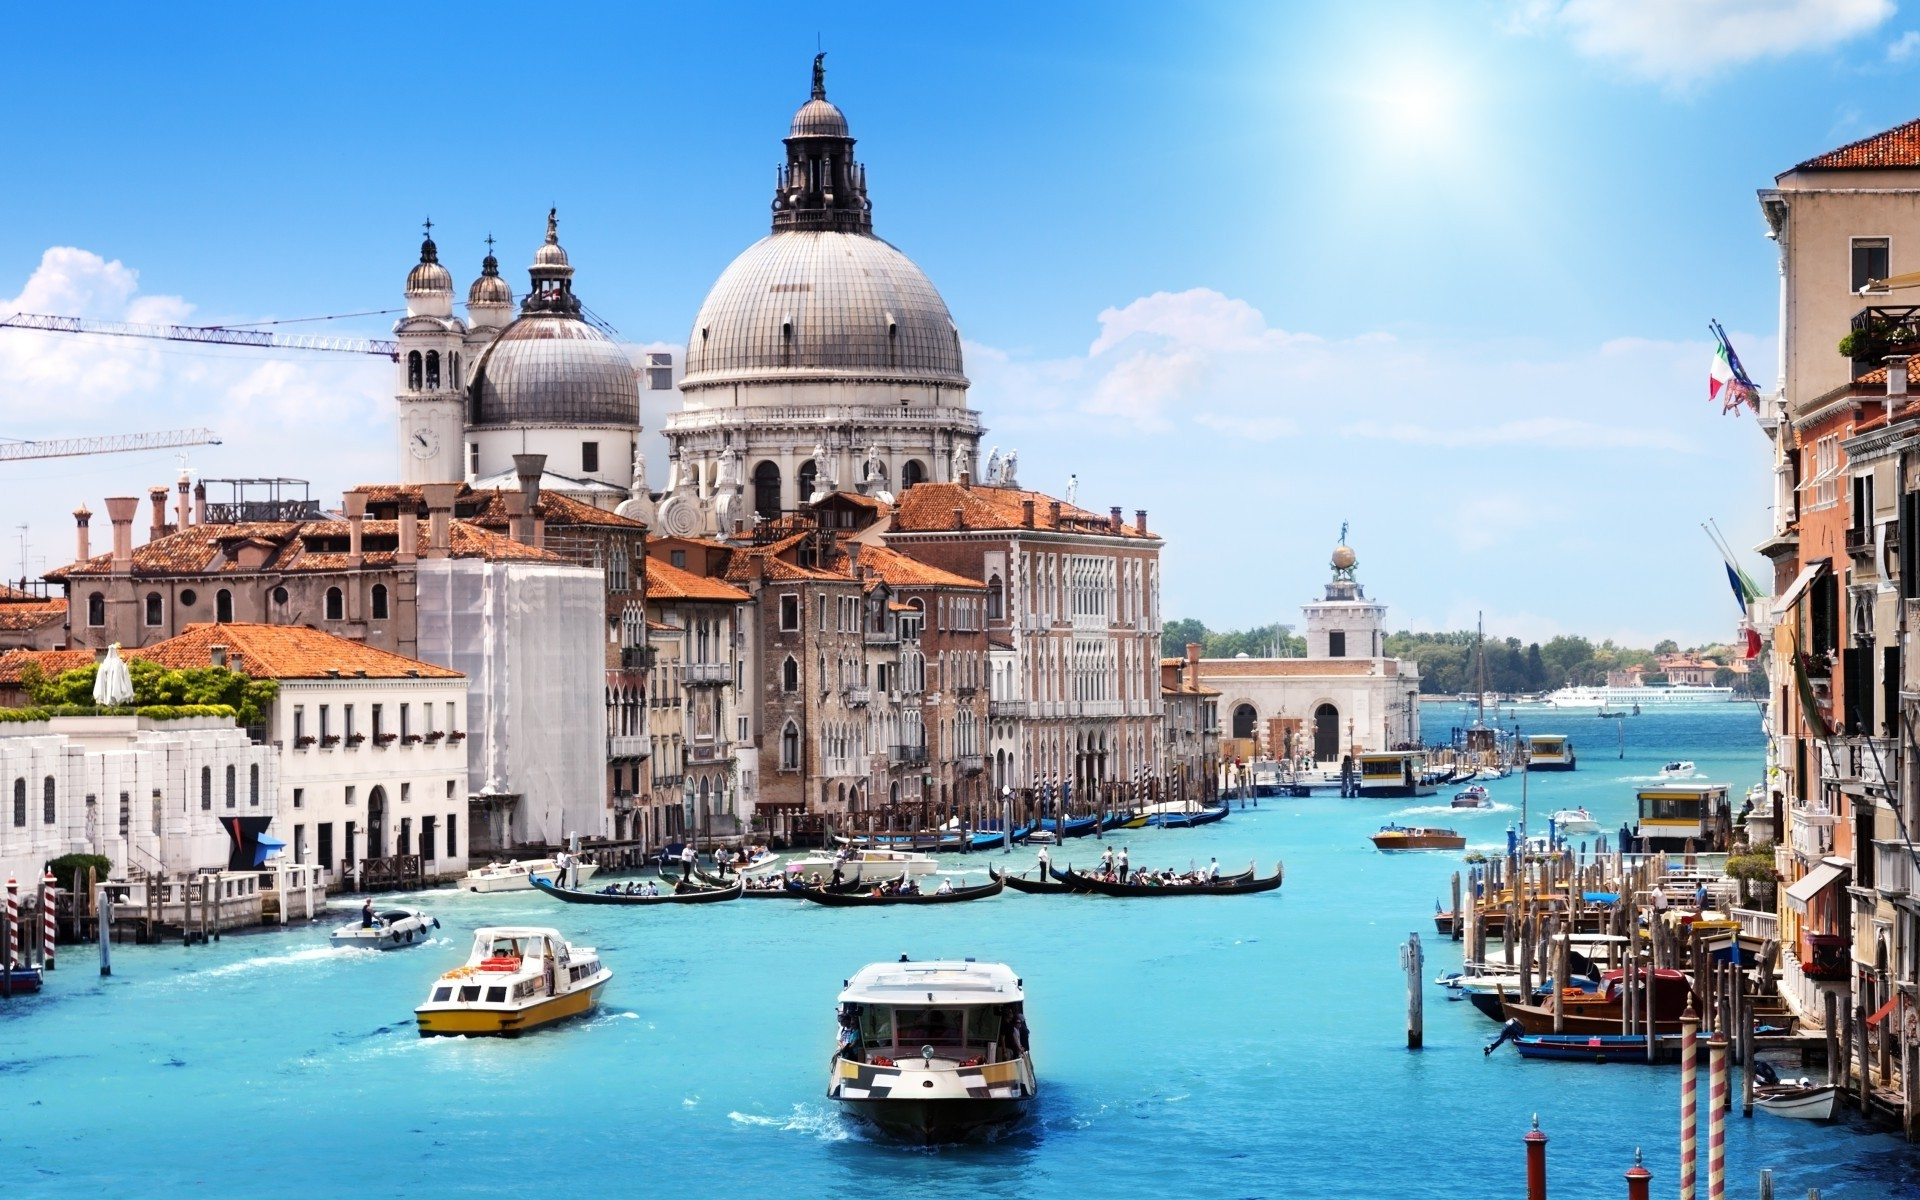 Venice Italy City Canal Building Landscape Boat 1920x1200